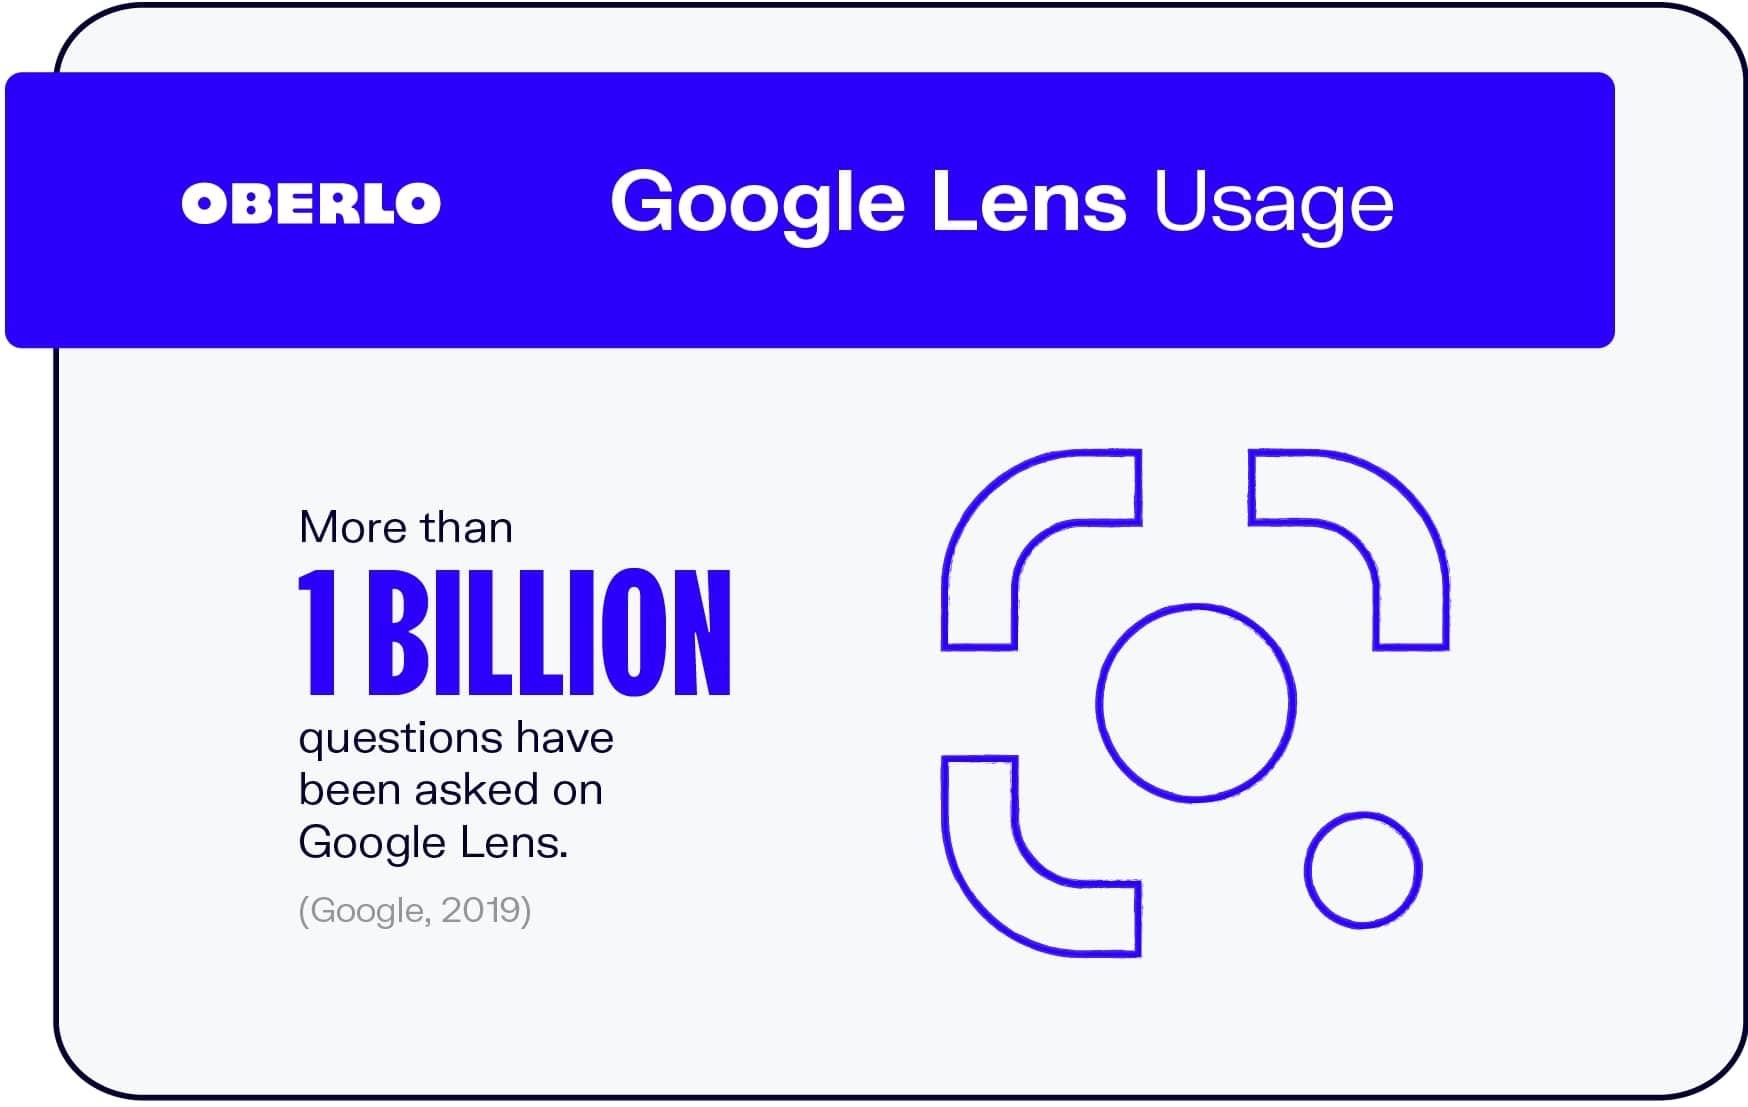 Google Lens Usage